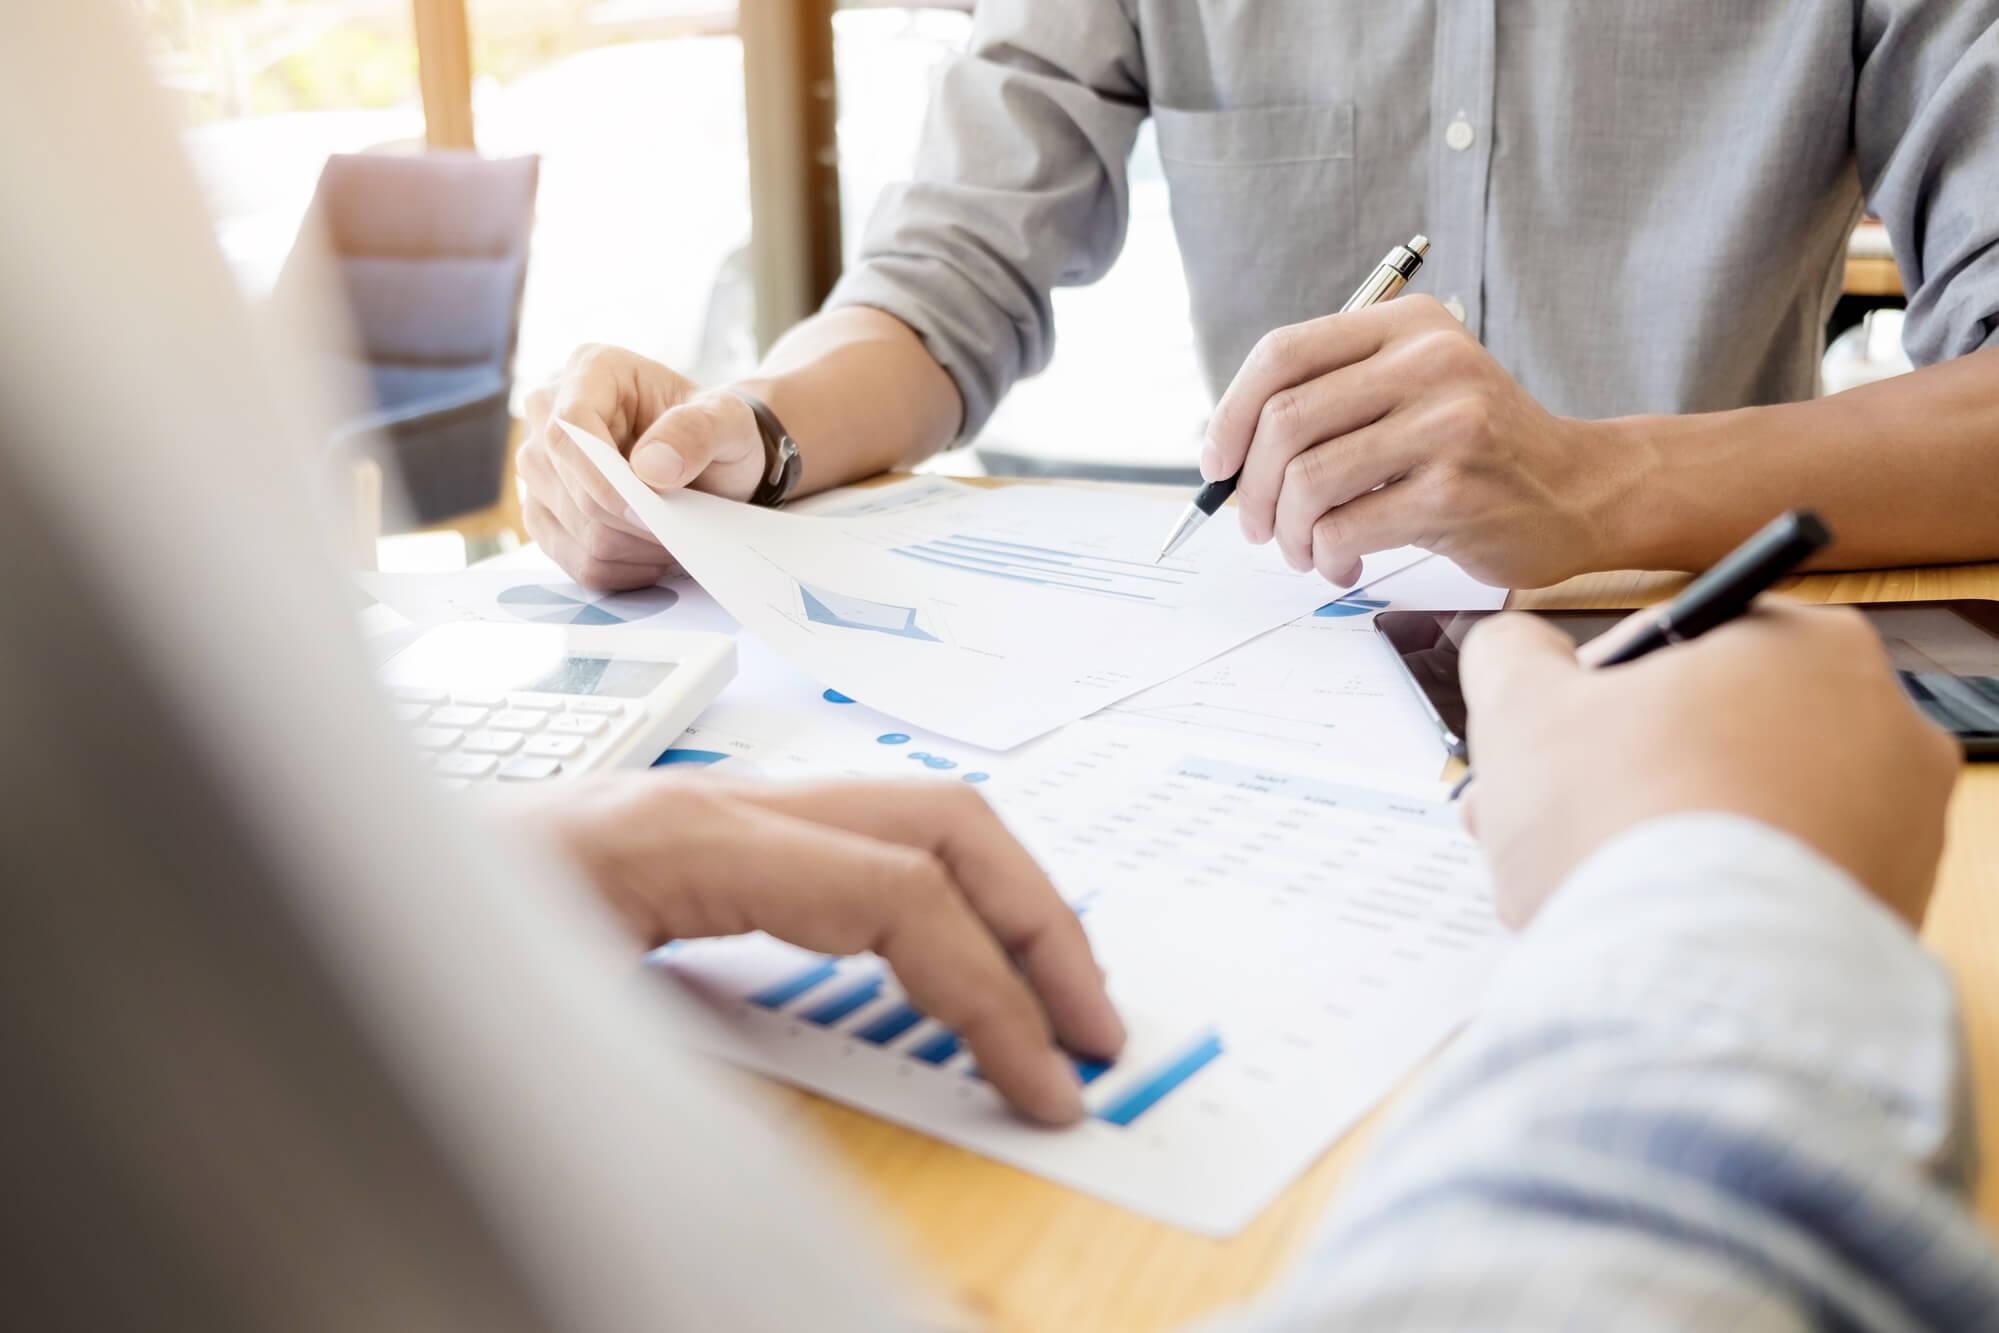 Veja A Importancia Da Consultoria Em Gestao Financeira Empresarial.jpeg